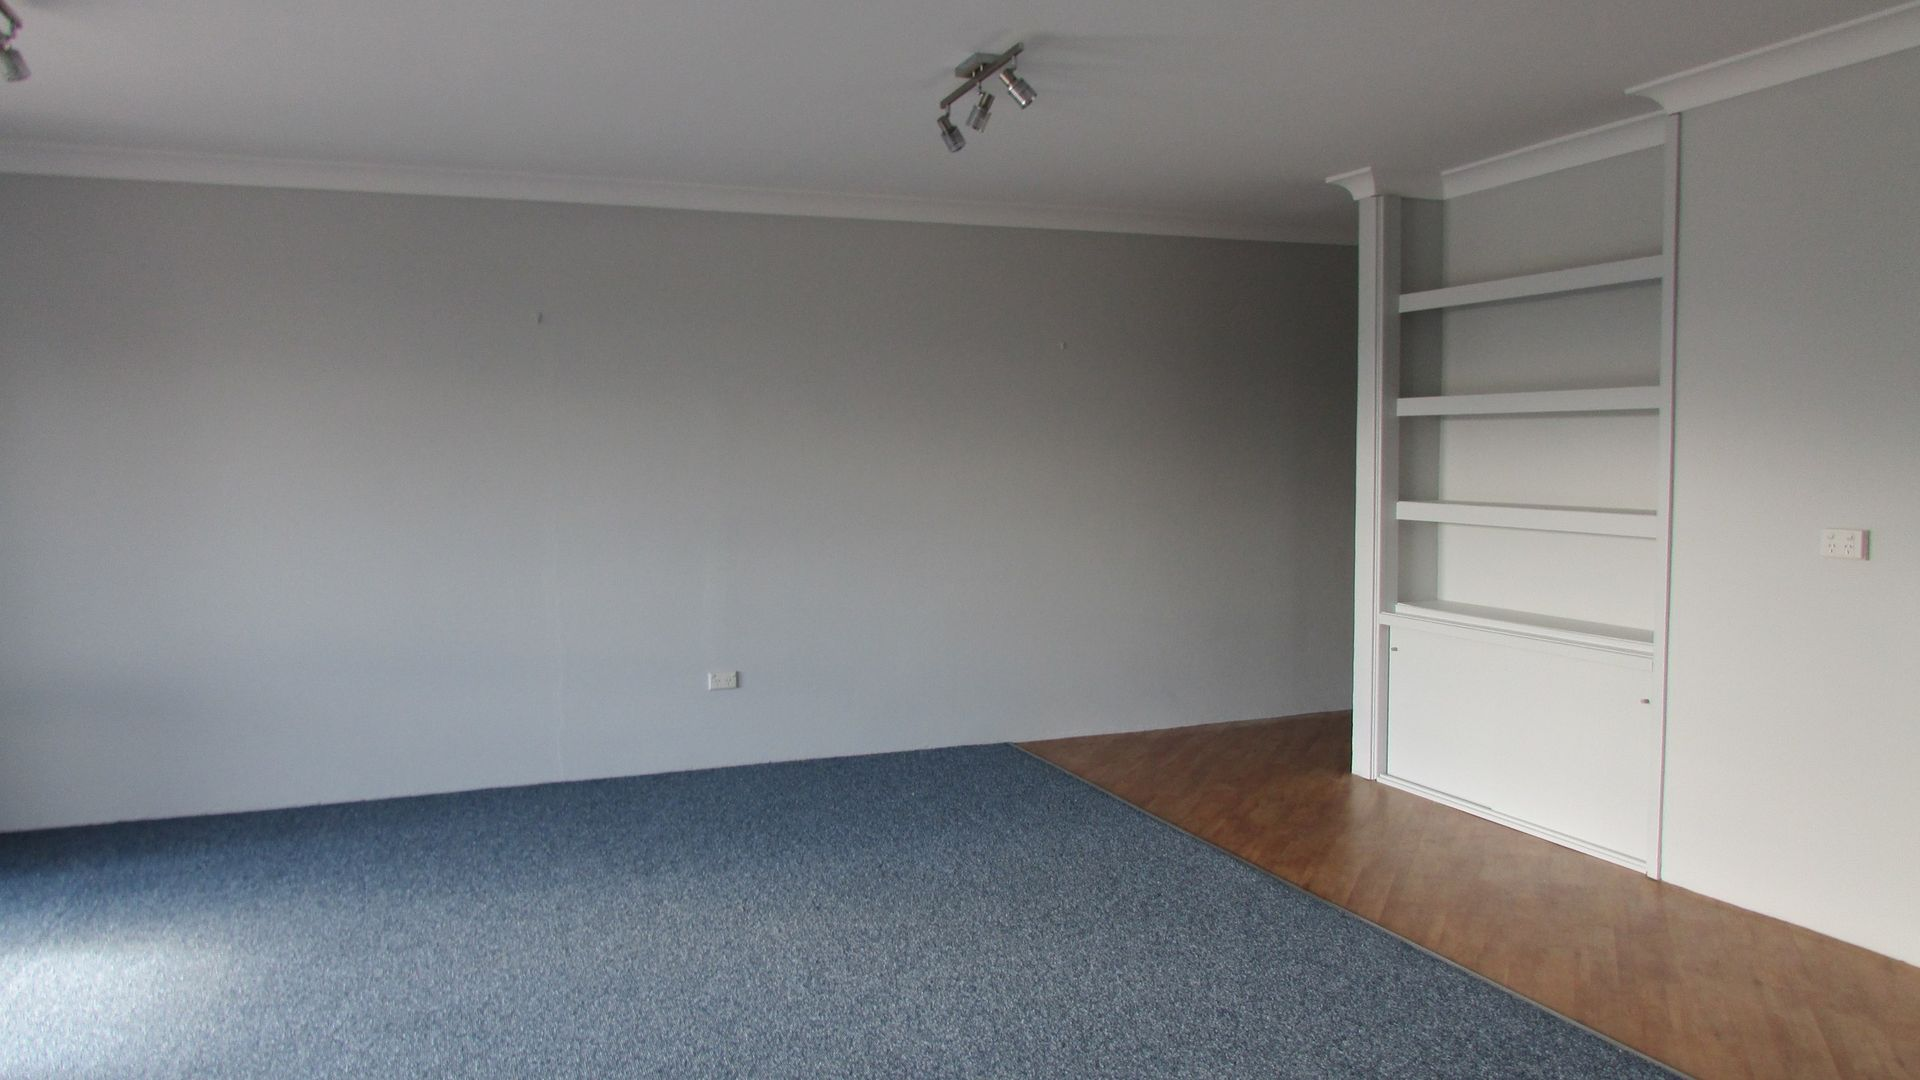 28/46-48 Keira Street, Wollongong NSW 2500, Image 2